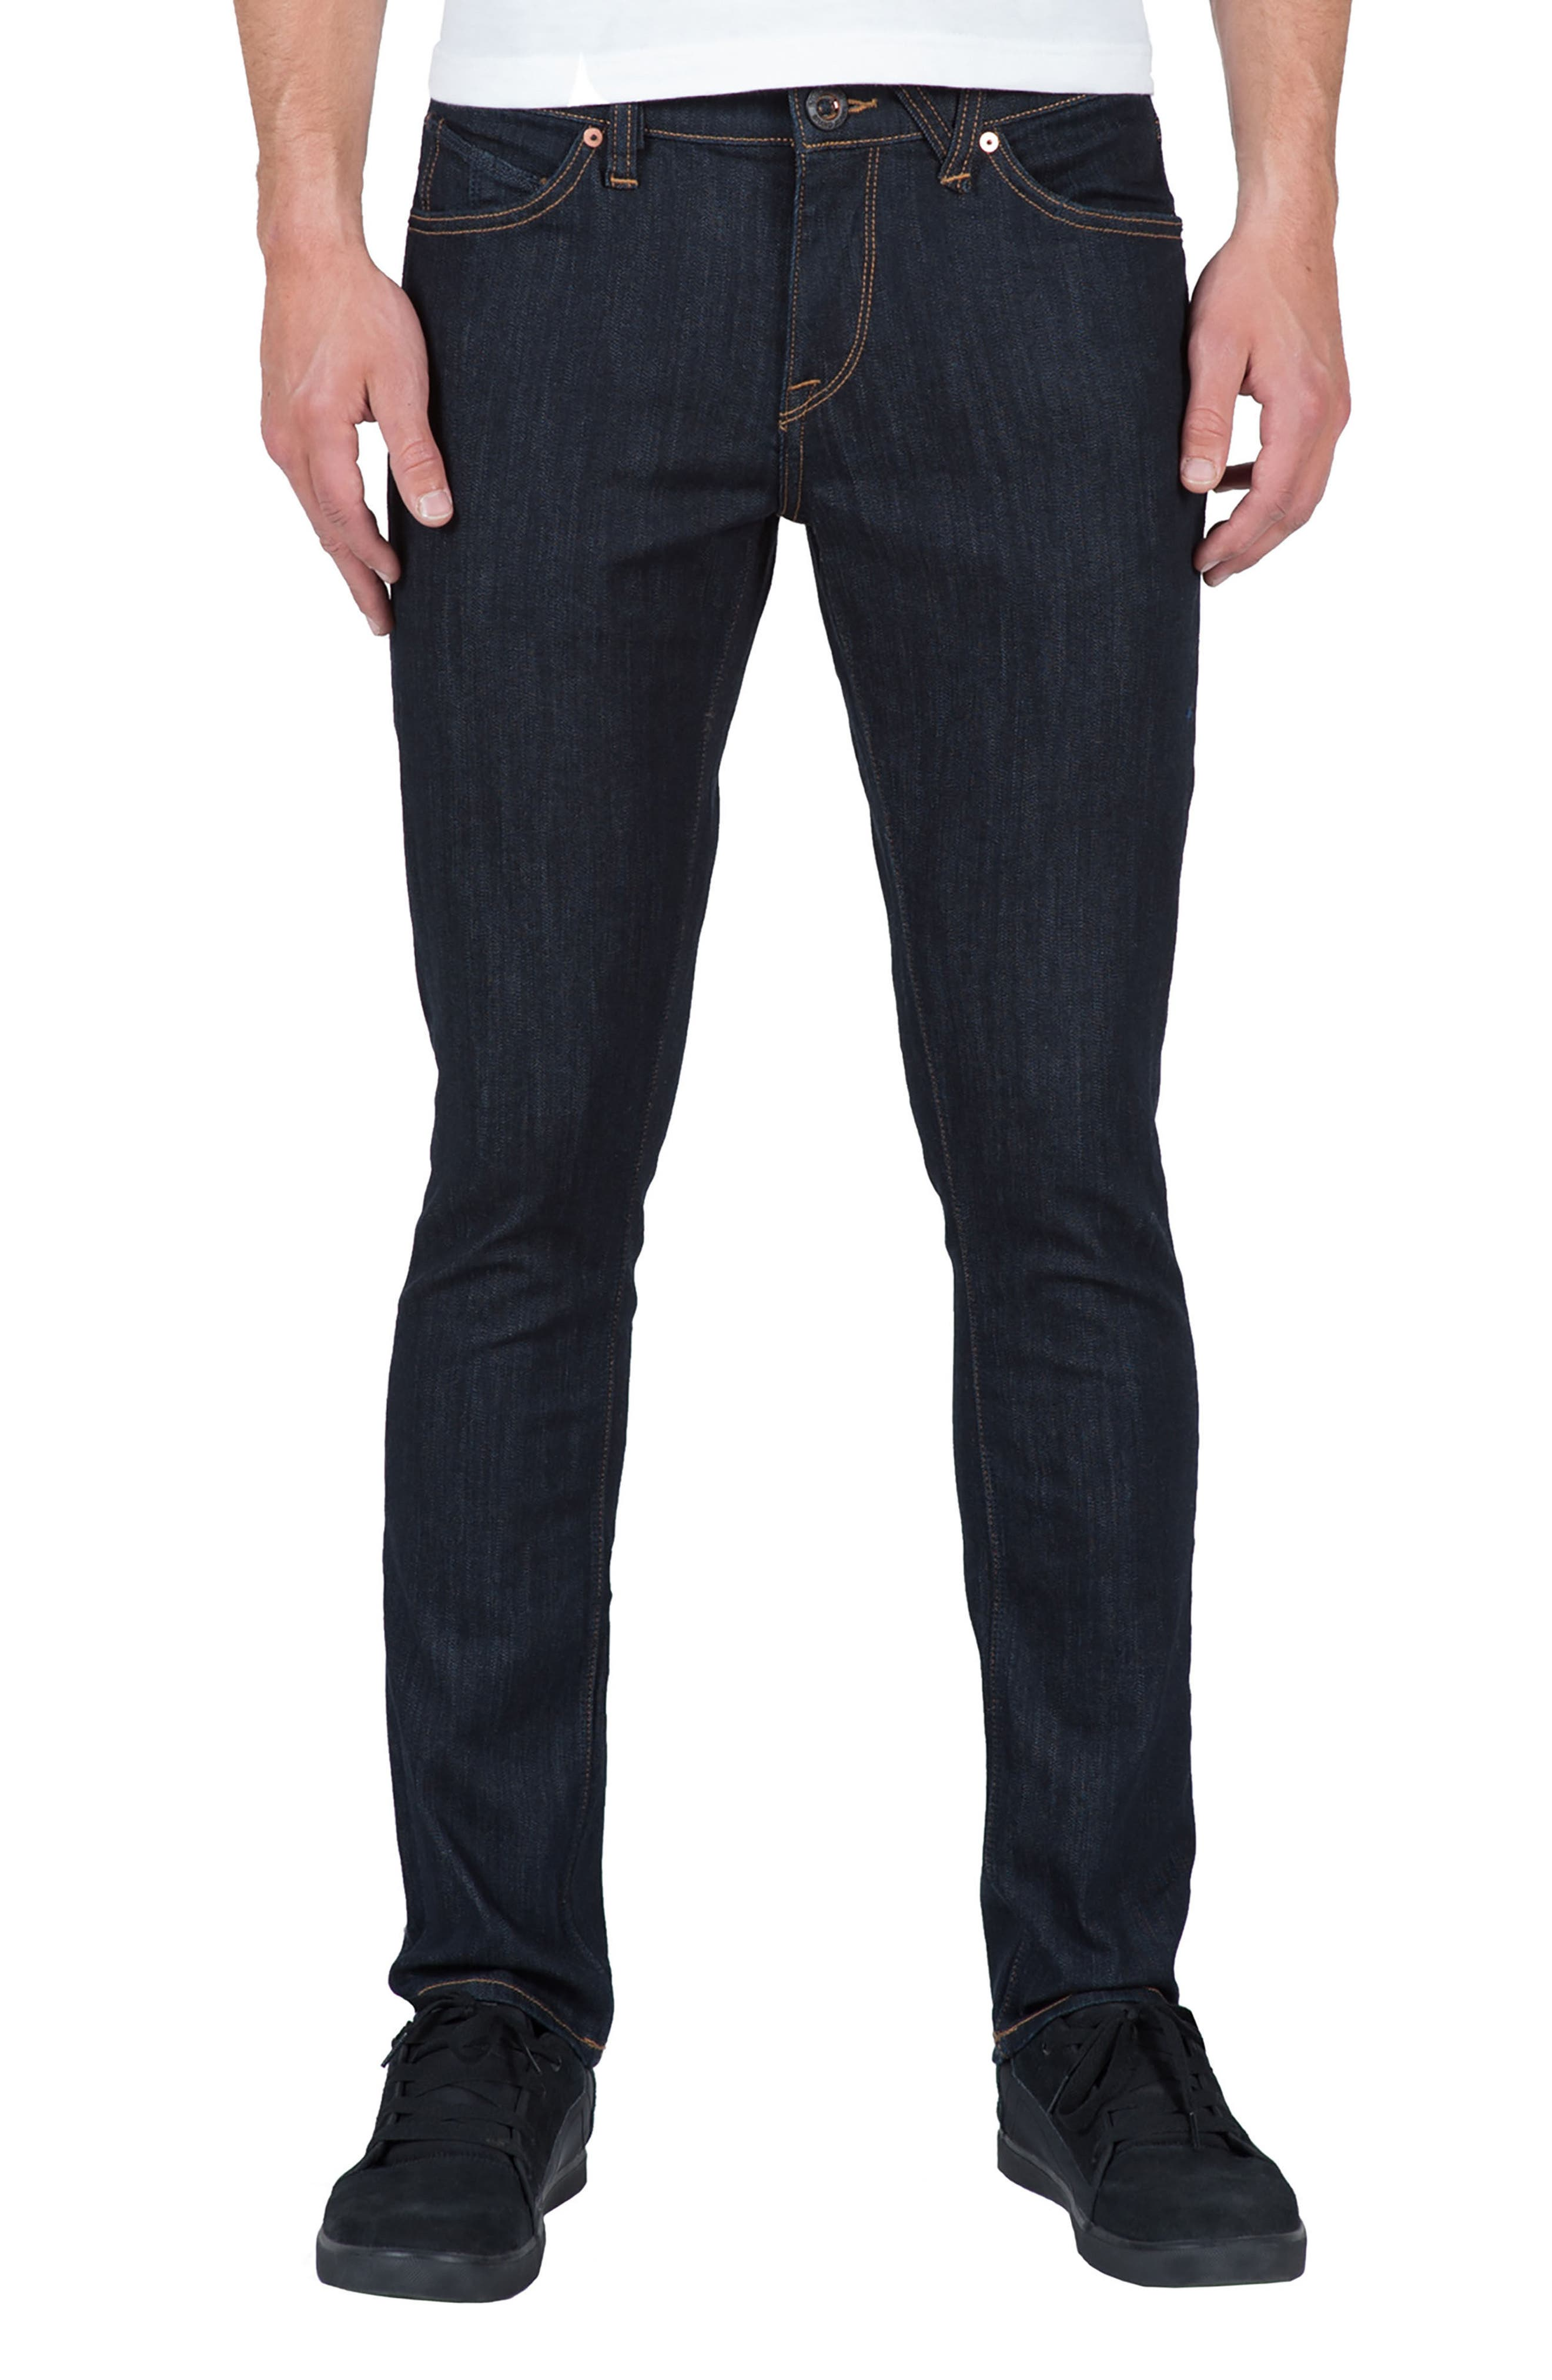 2x4 Slim Straight Leg Jeans,                             Main thumbnail 3, color,